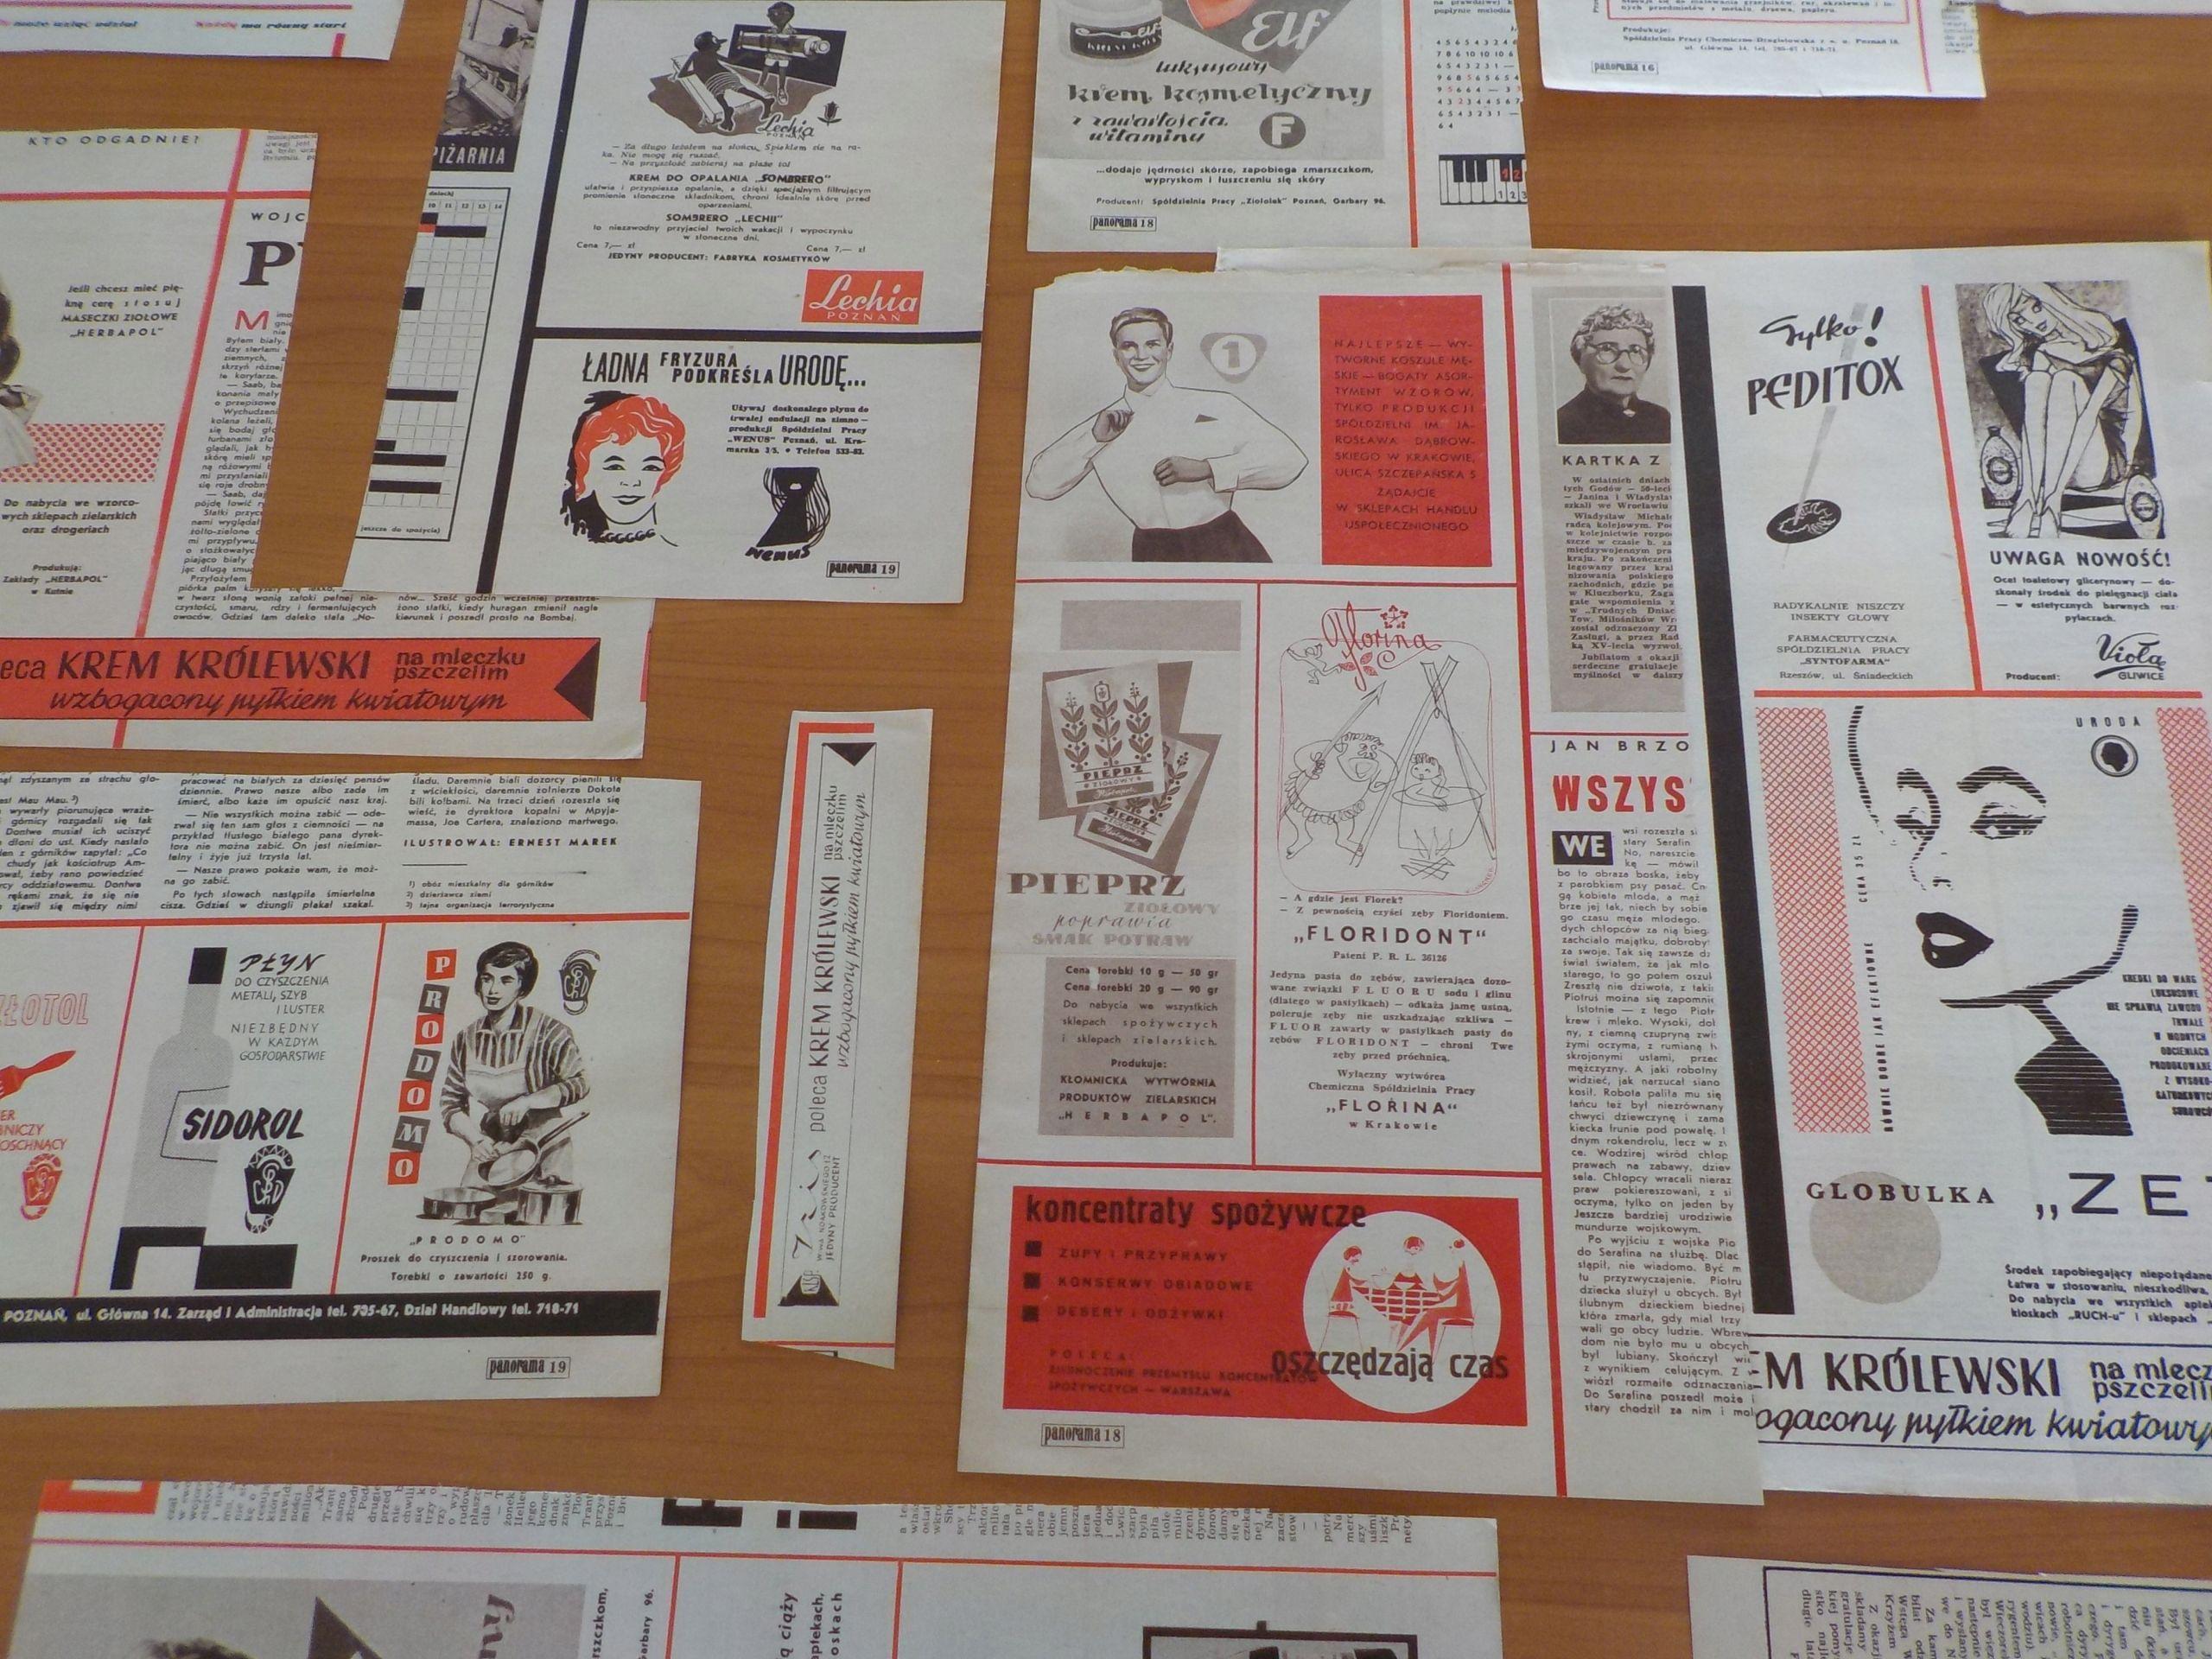 Reklamy Prl Lata 61 62 Duzy Zestaw Panorama 7634482567 Oficjalne Archiwum Allegro Bullet Journal Journal Event